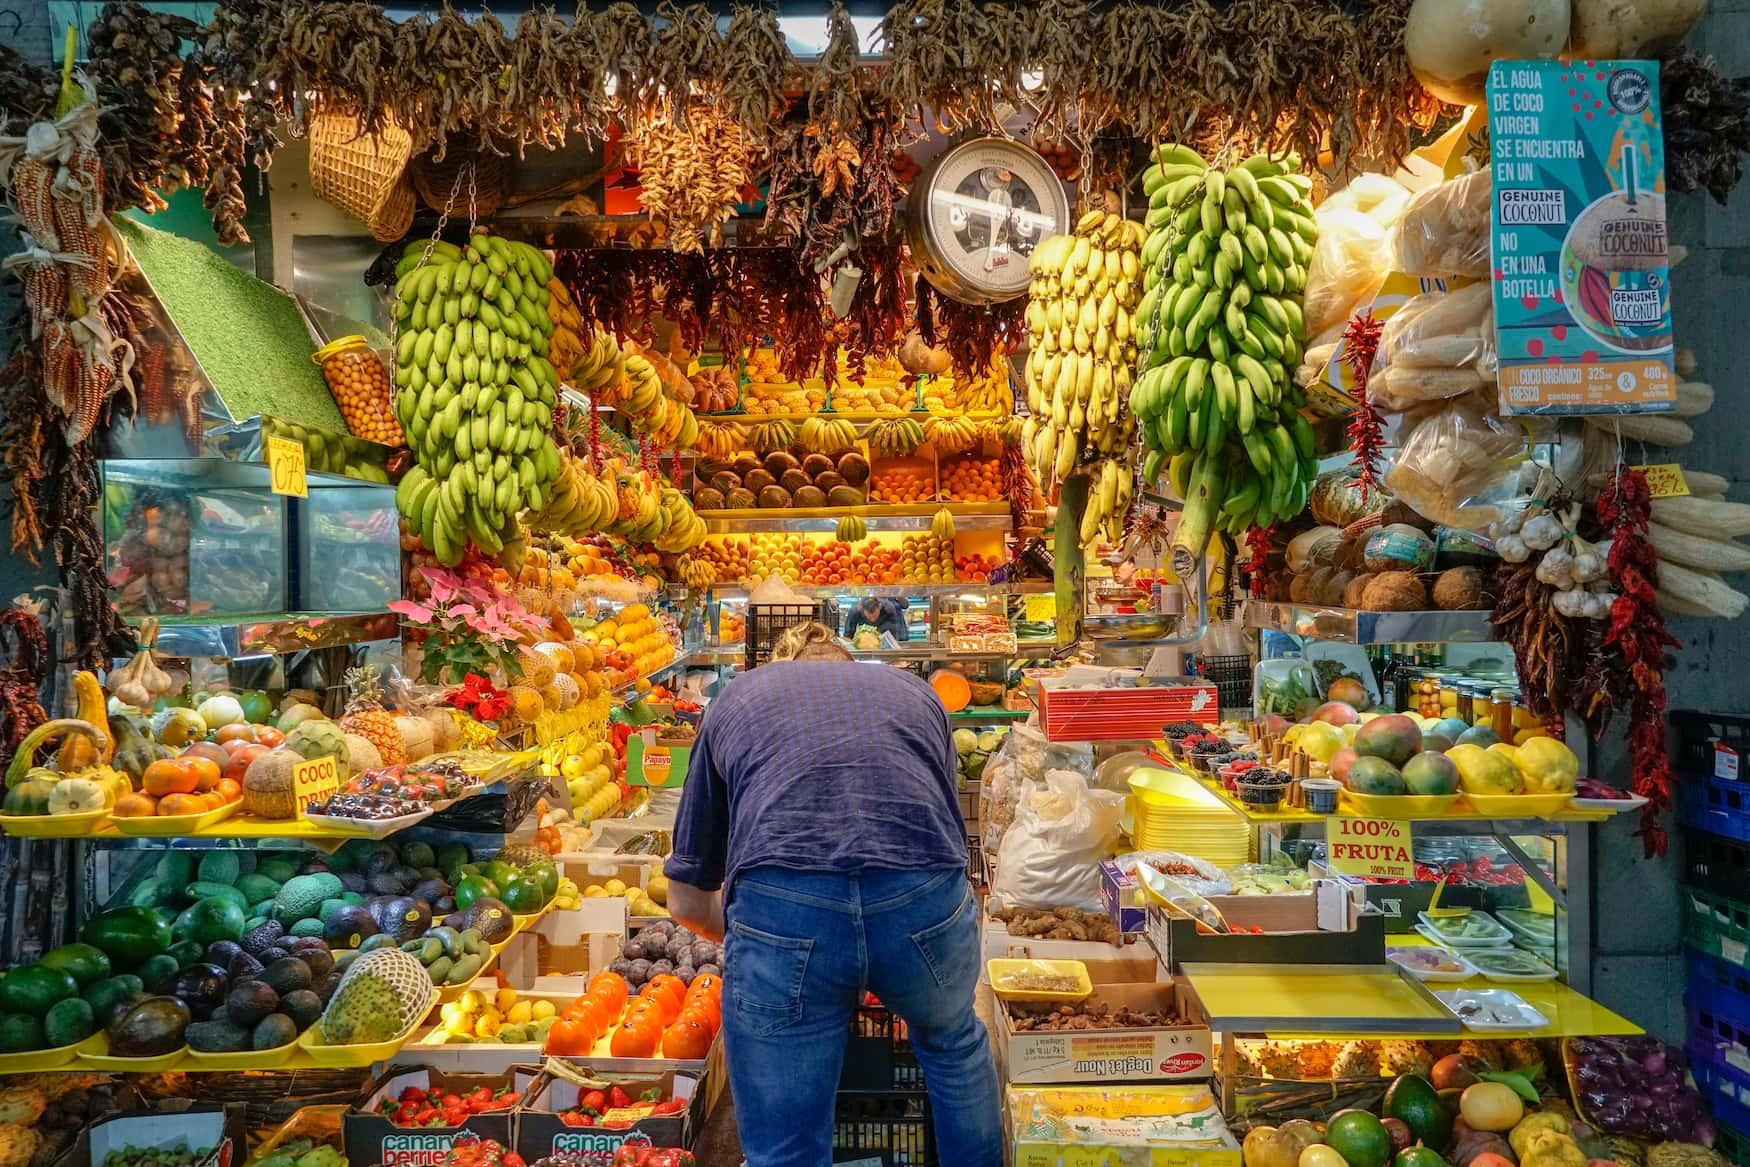 Tropische Früchte an Marktstand in Las Palmas de Gran Canaria